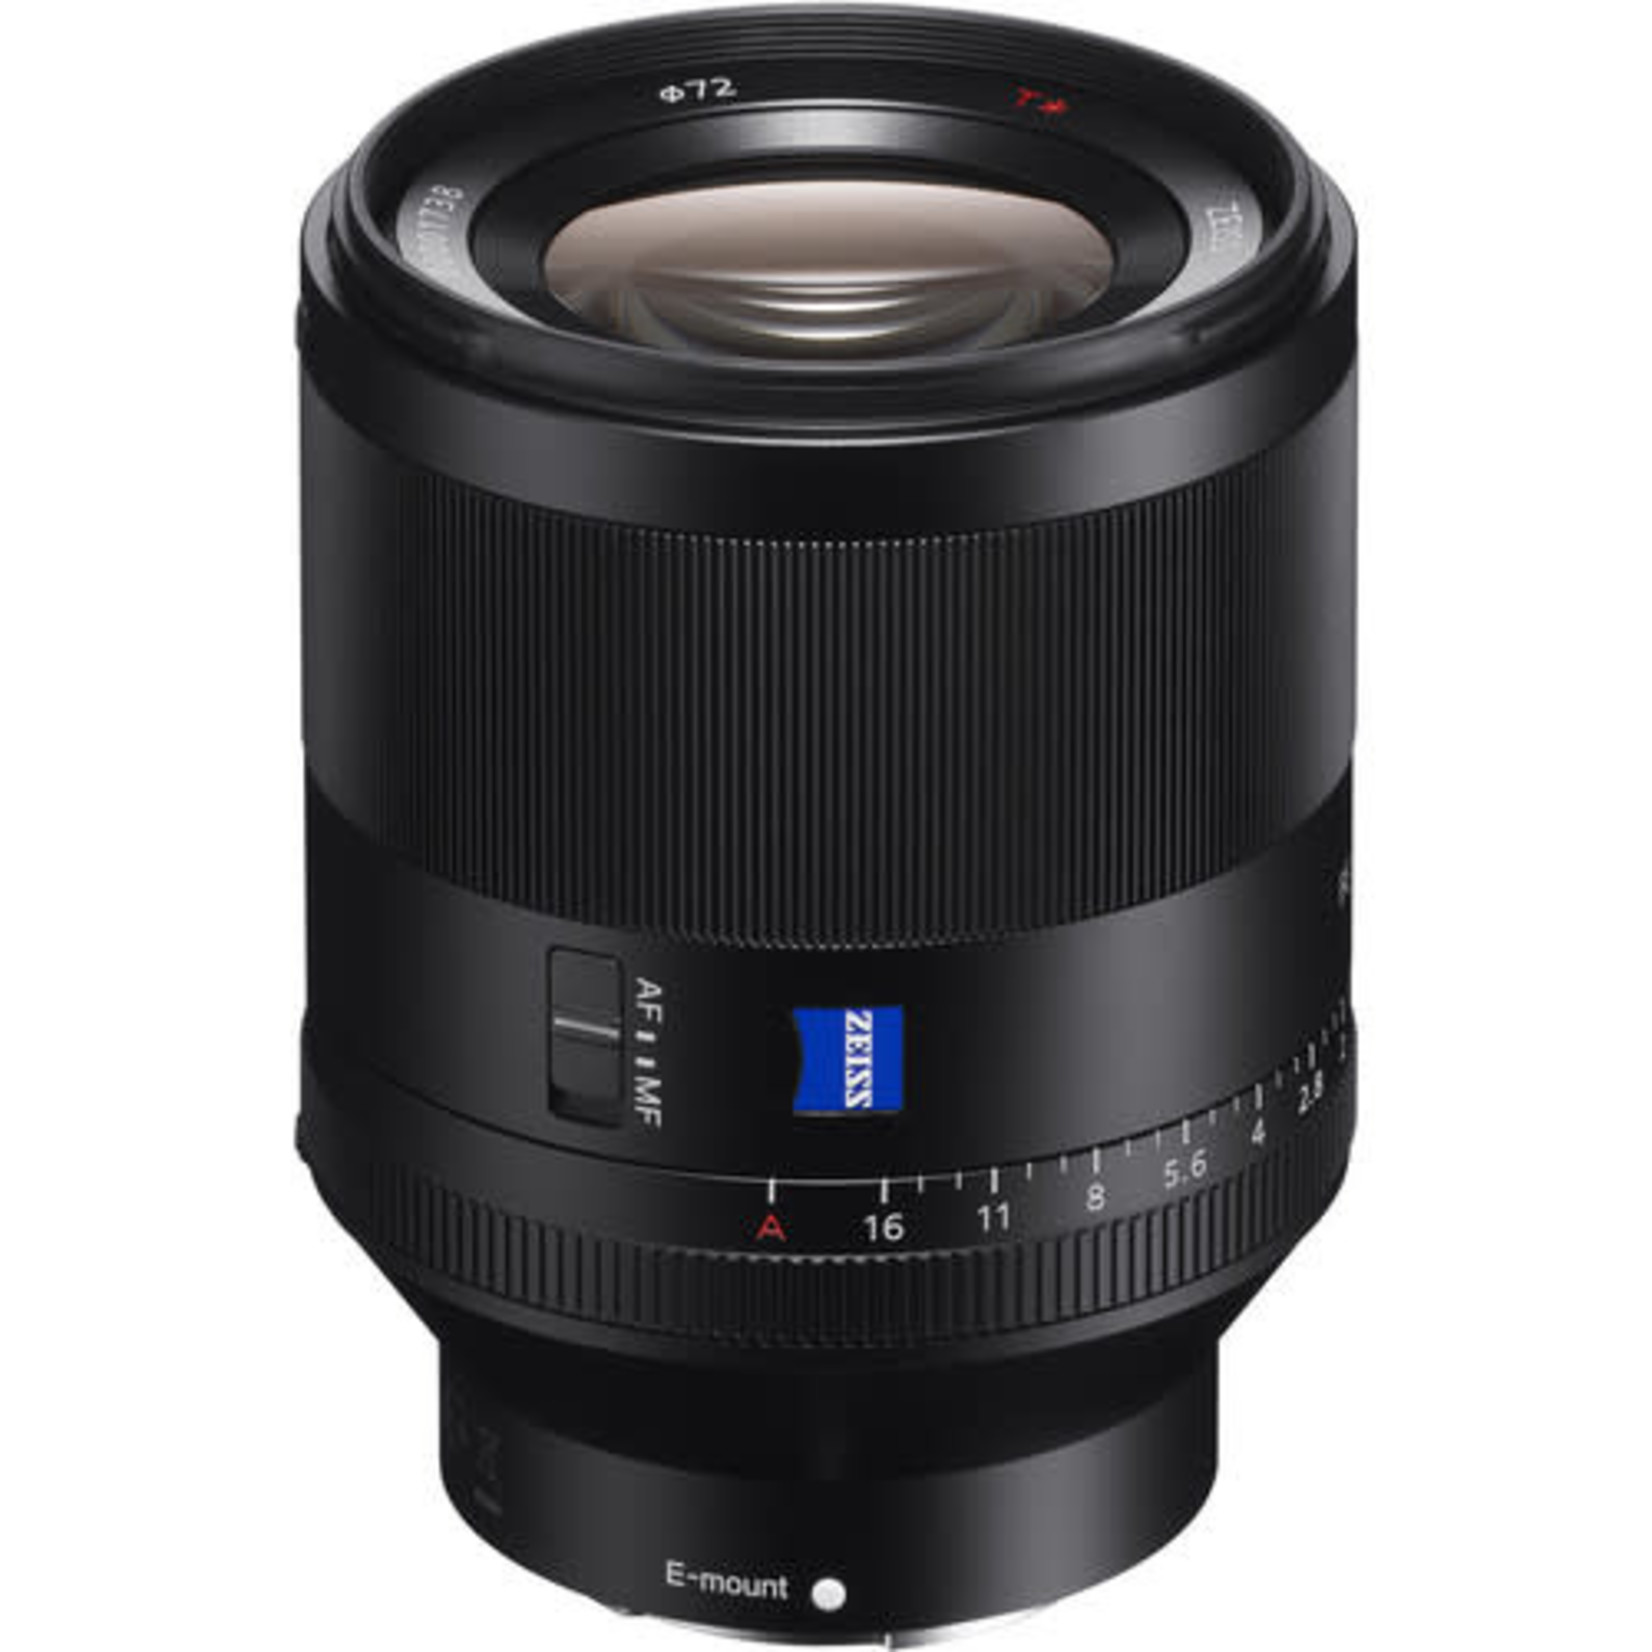 Sony Sony Planar T* FE 50mm f/1.4 ZA Lens